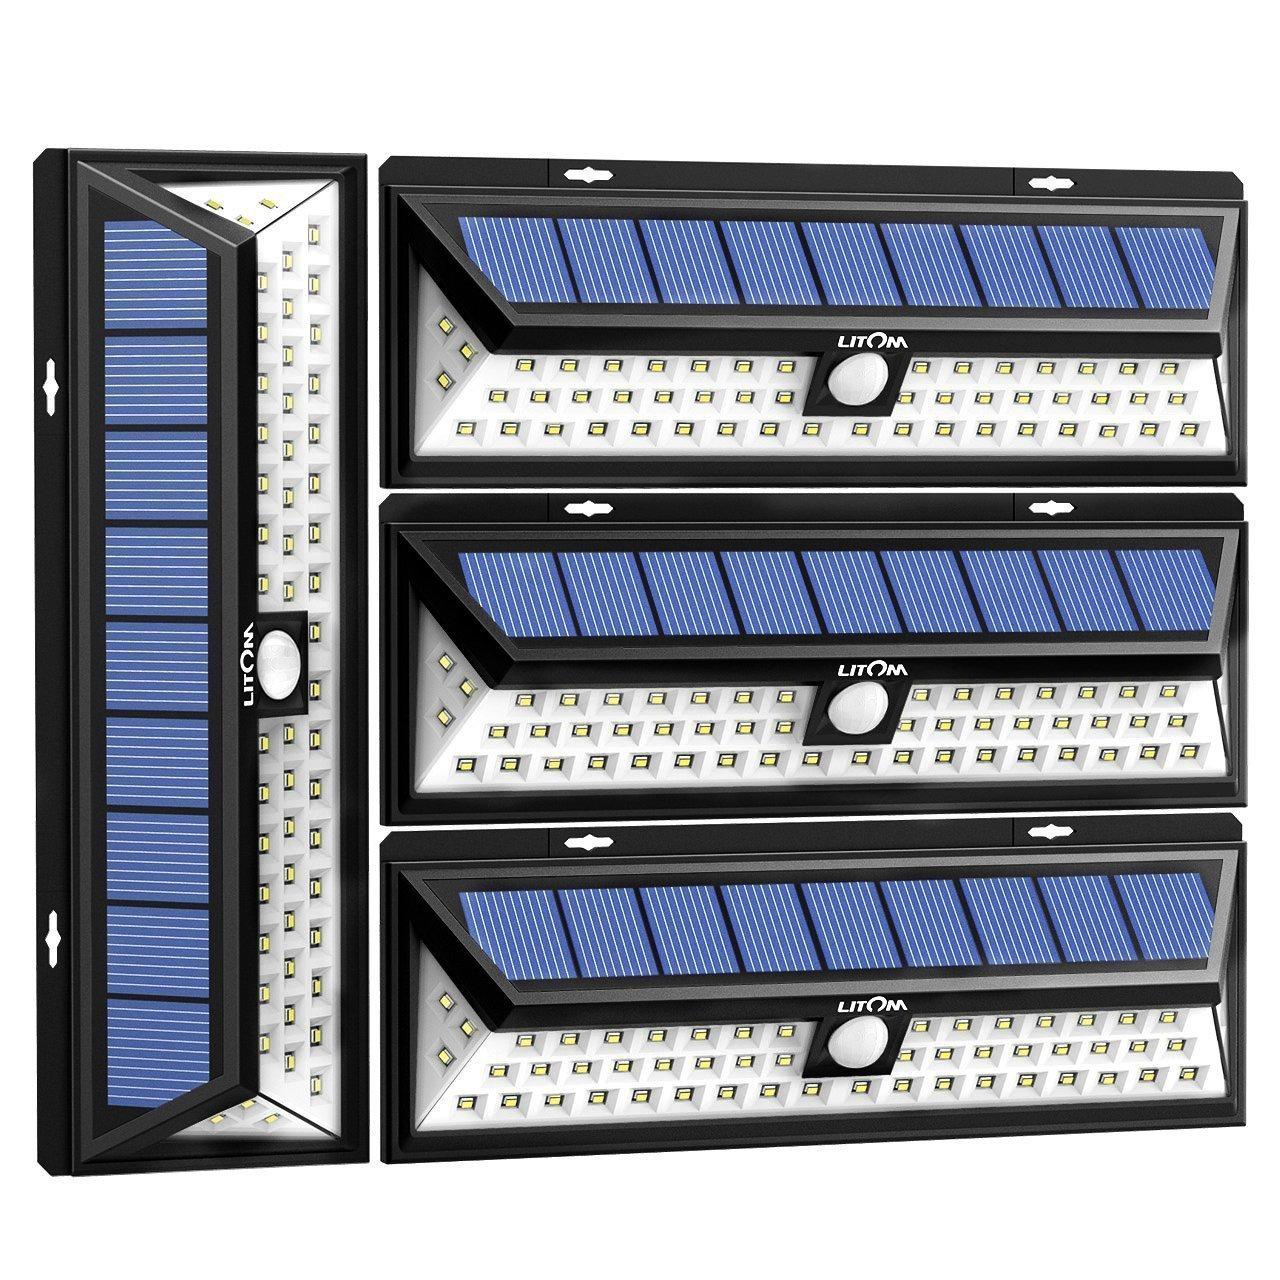 (2 PACK) - Litom 54 LED Solar Lights Outdoor Solar Power Light with Motion Sensor for Driveway Garden 2 Pack B01L3CG2PA 22933 2パック